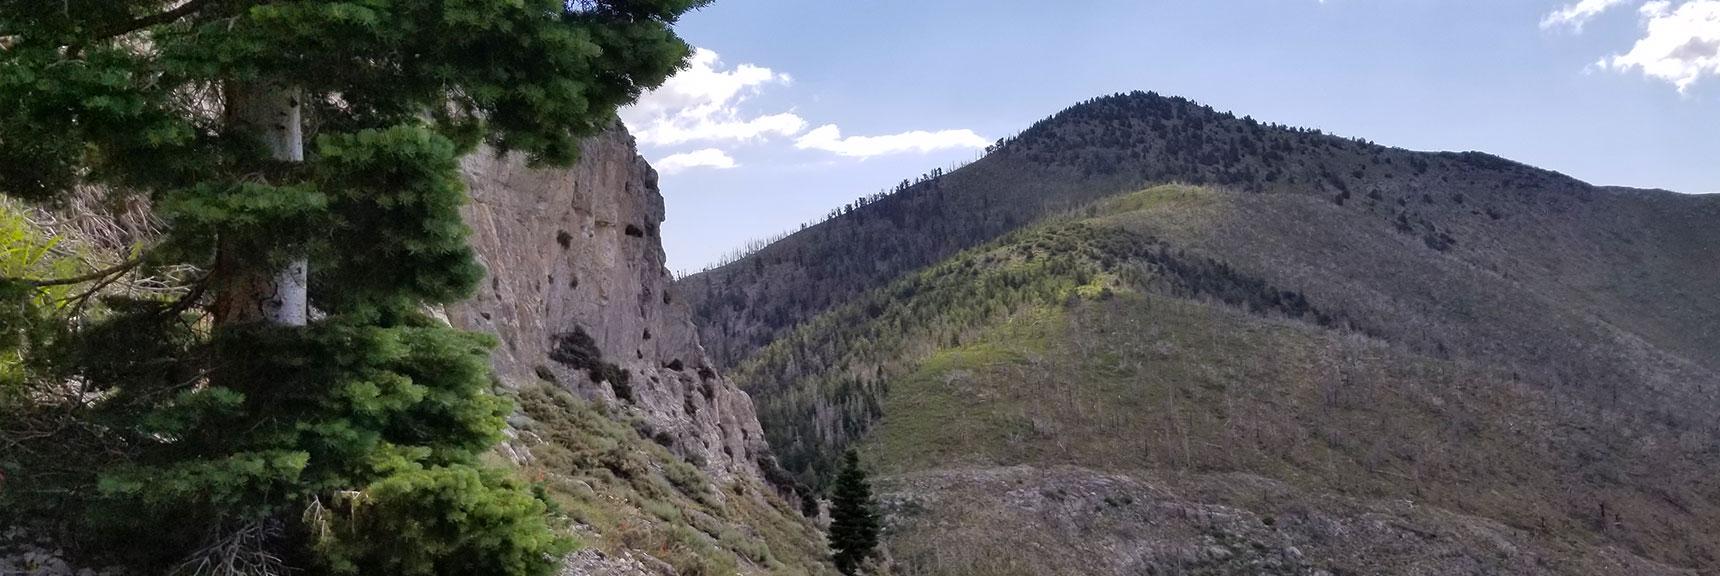 Harris Mt. from S. Climb Tr. | Mt Charleston Wilderness | Spring Mountains, Nevada